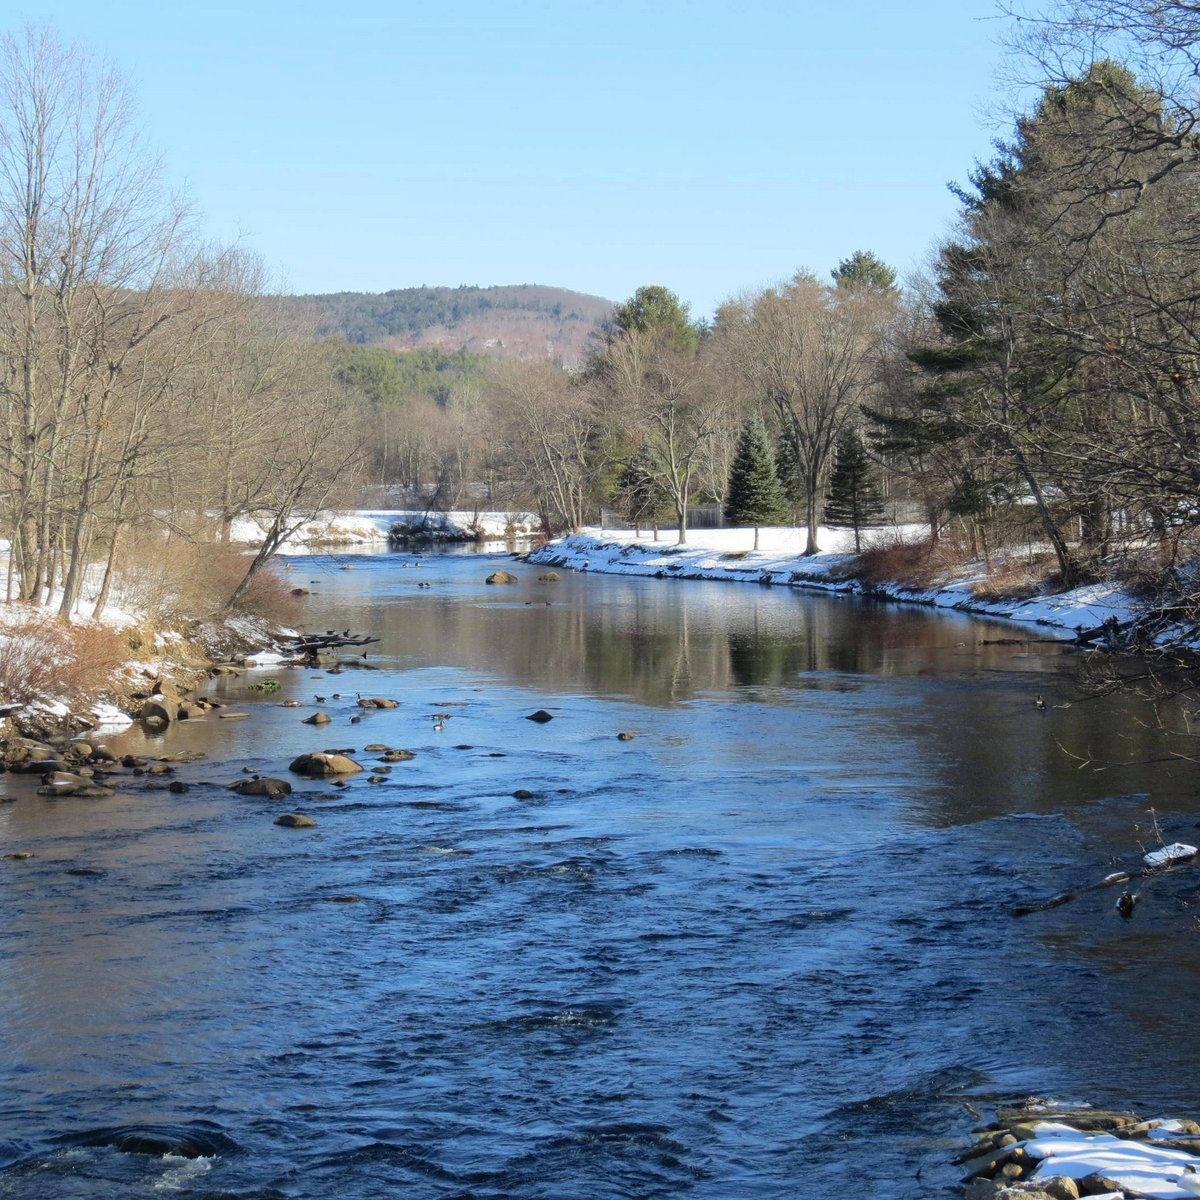 2. Ashuelot River on 3-9-13